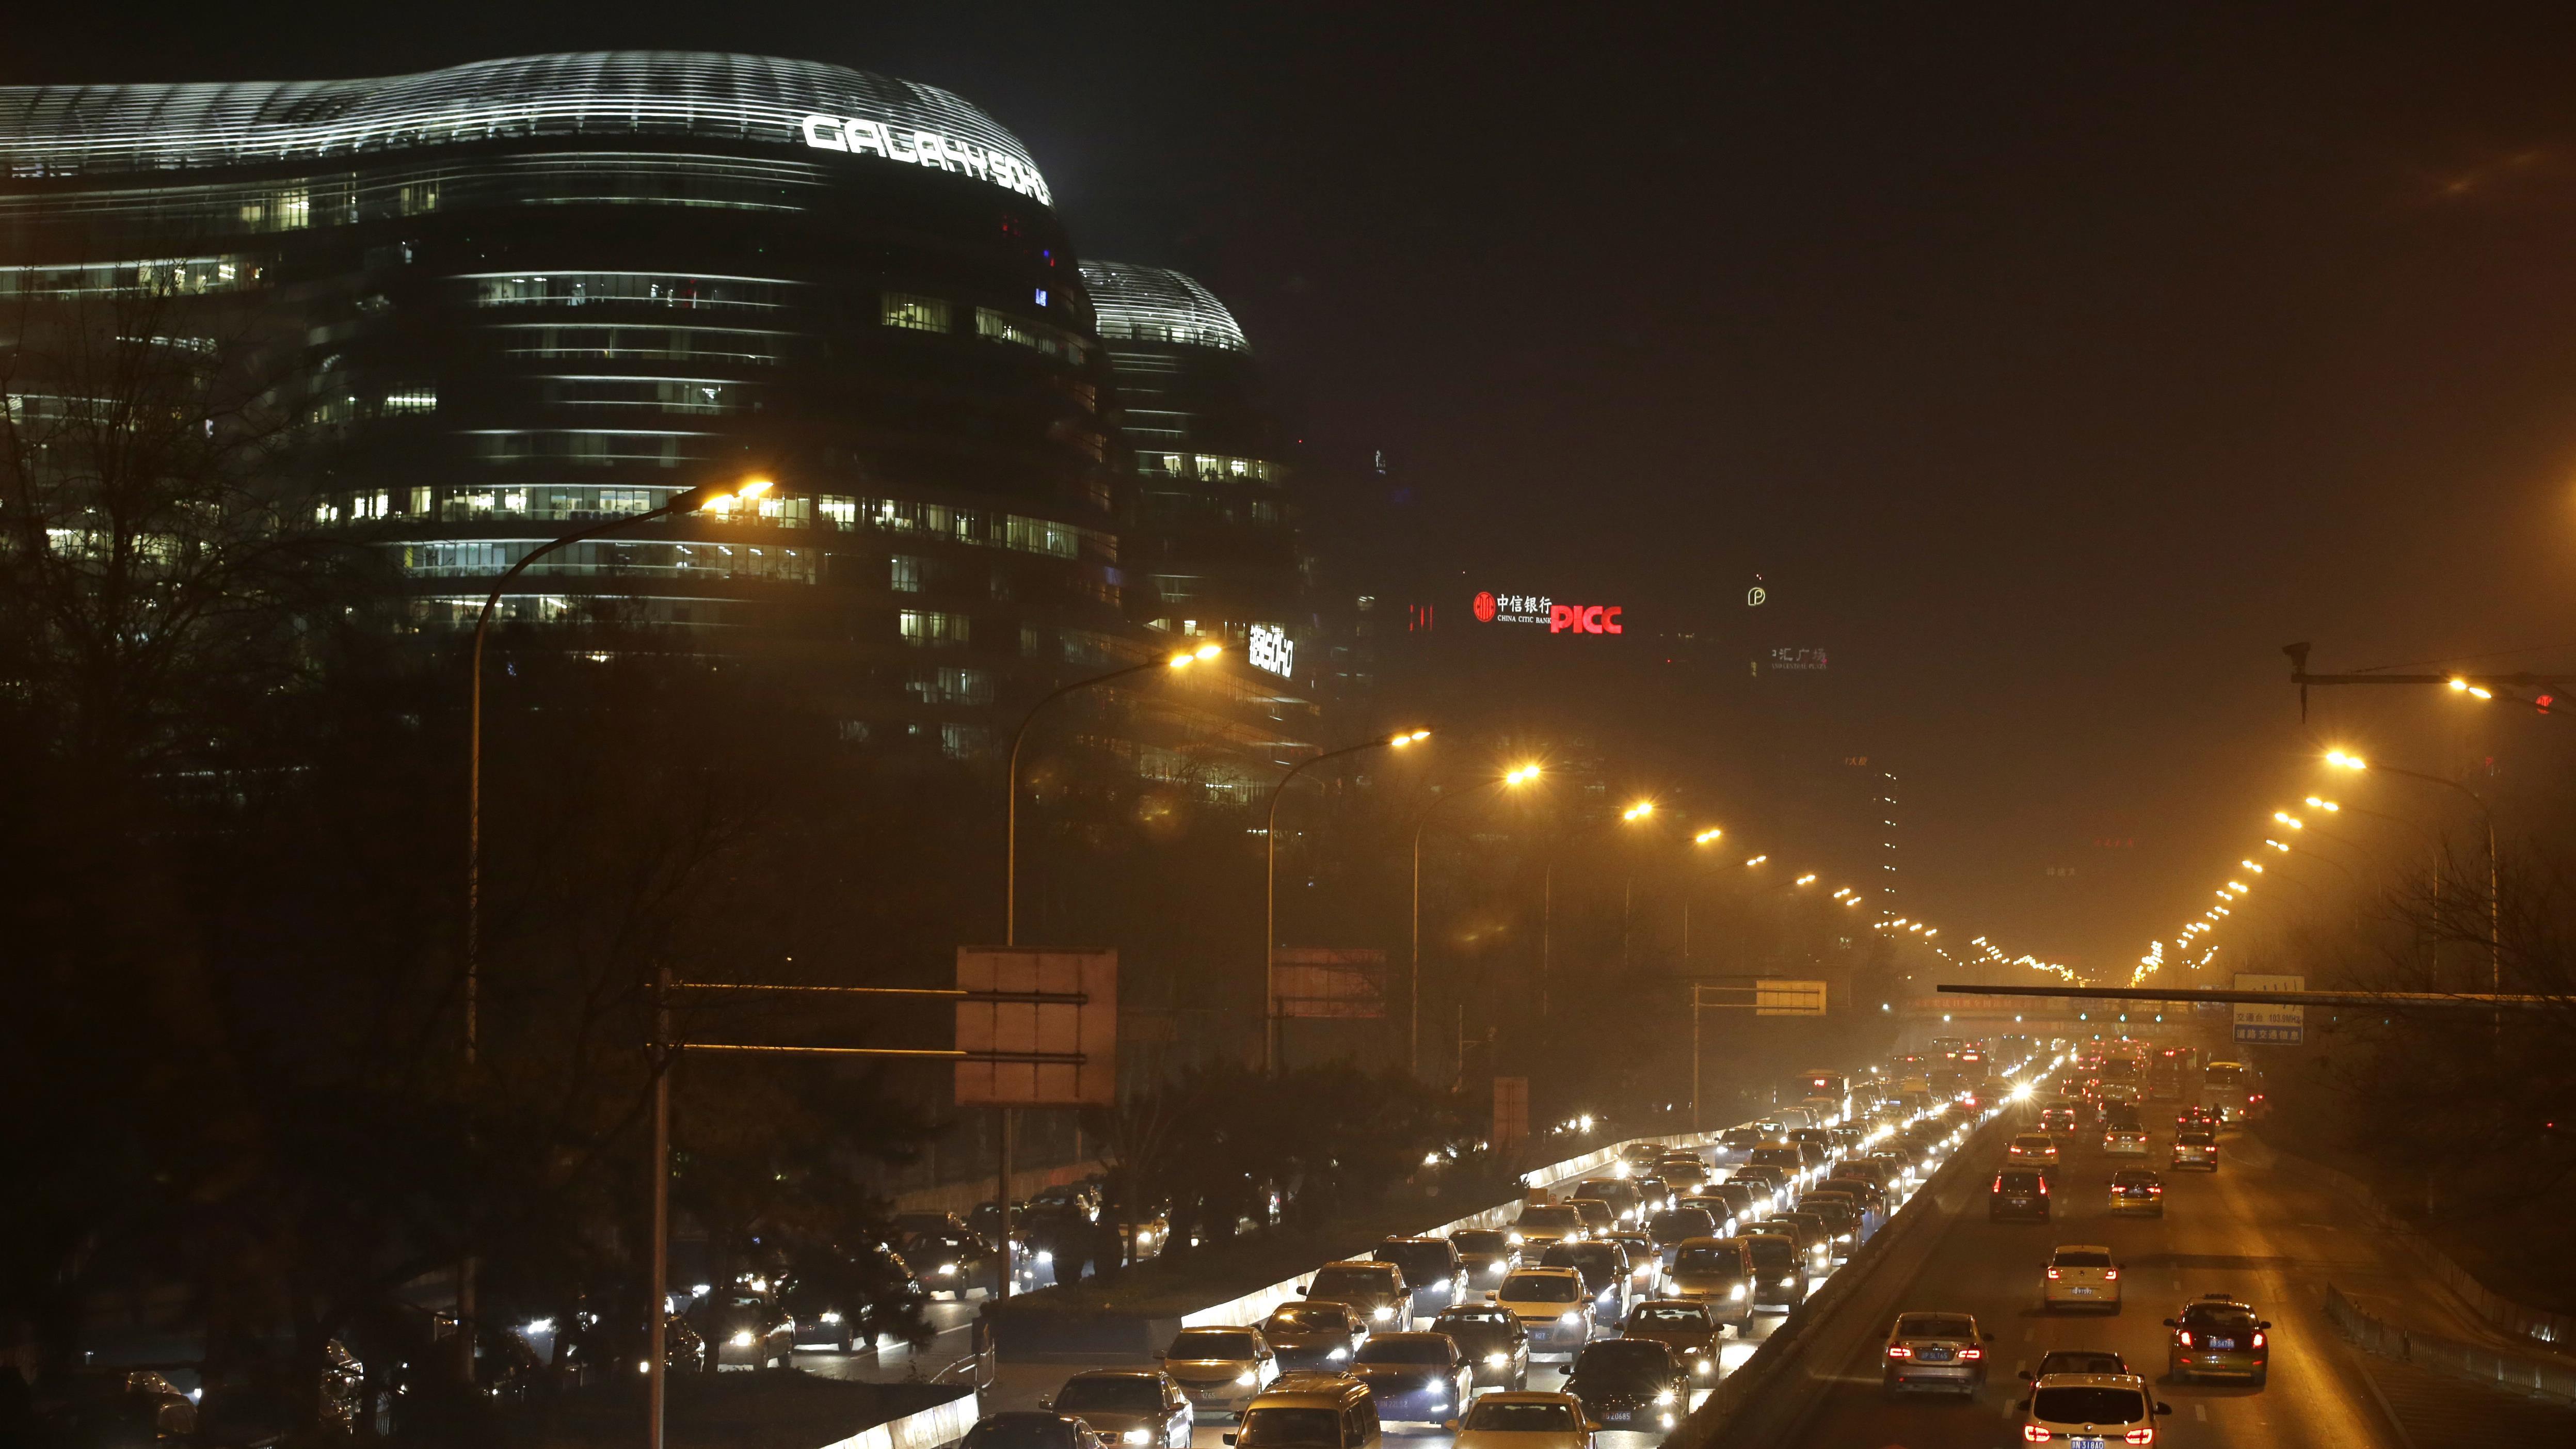 La pollution lumineuse ne cesse d'augmenter